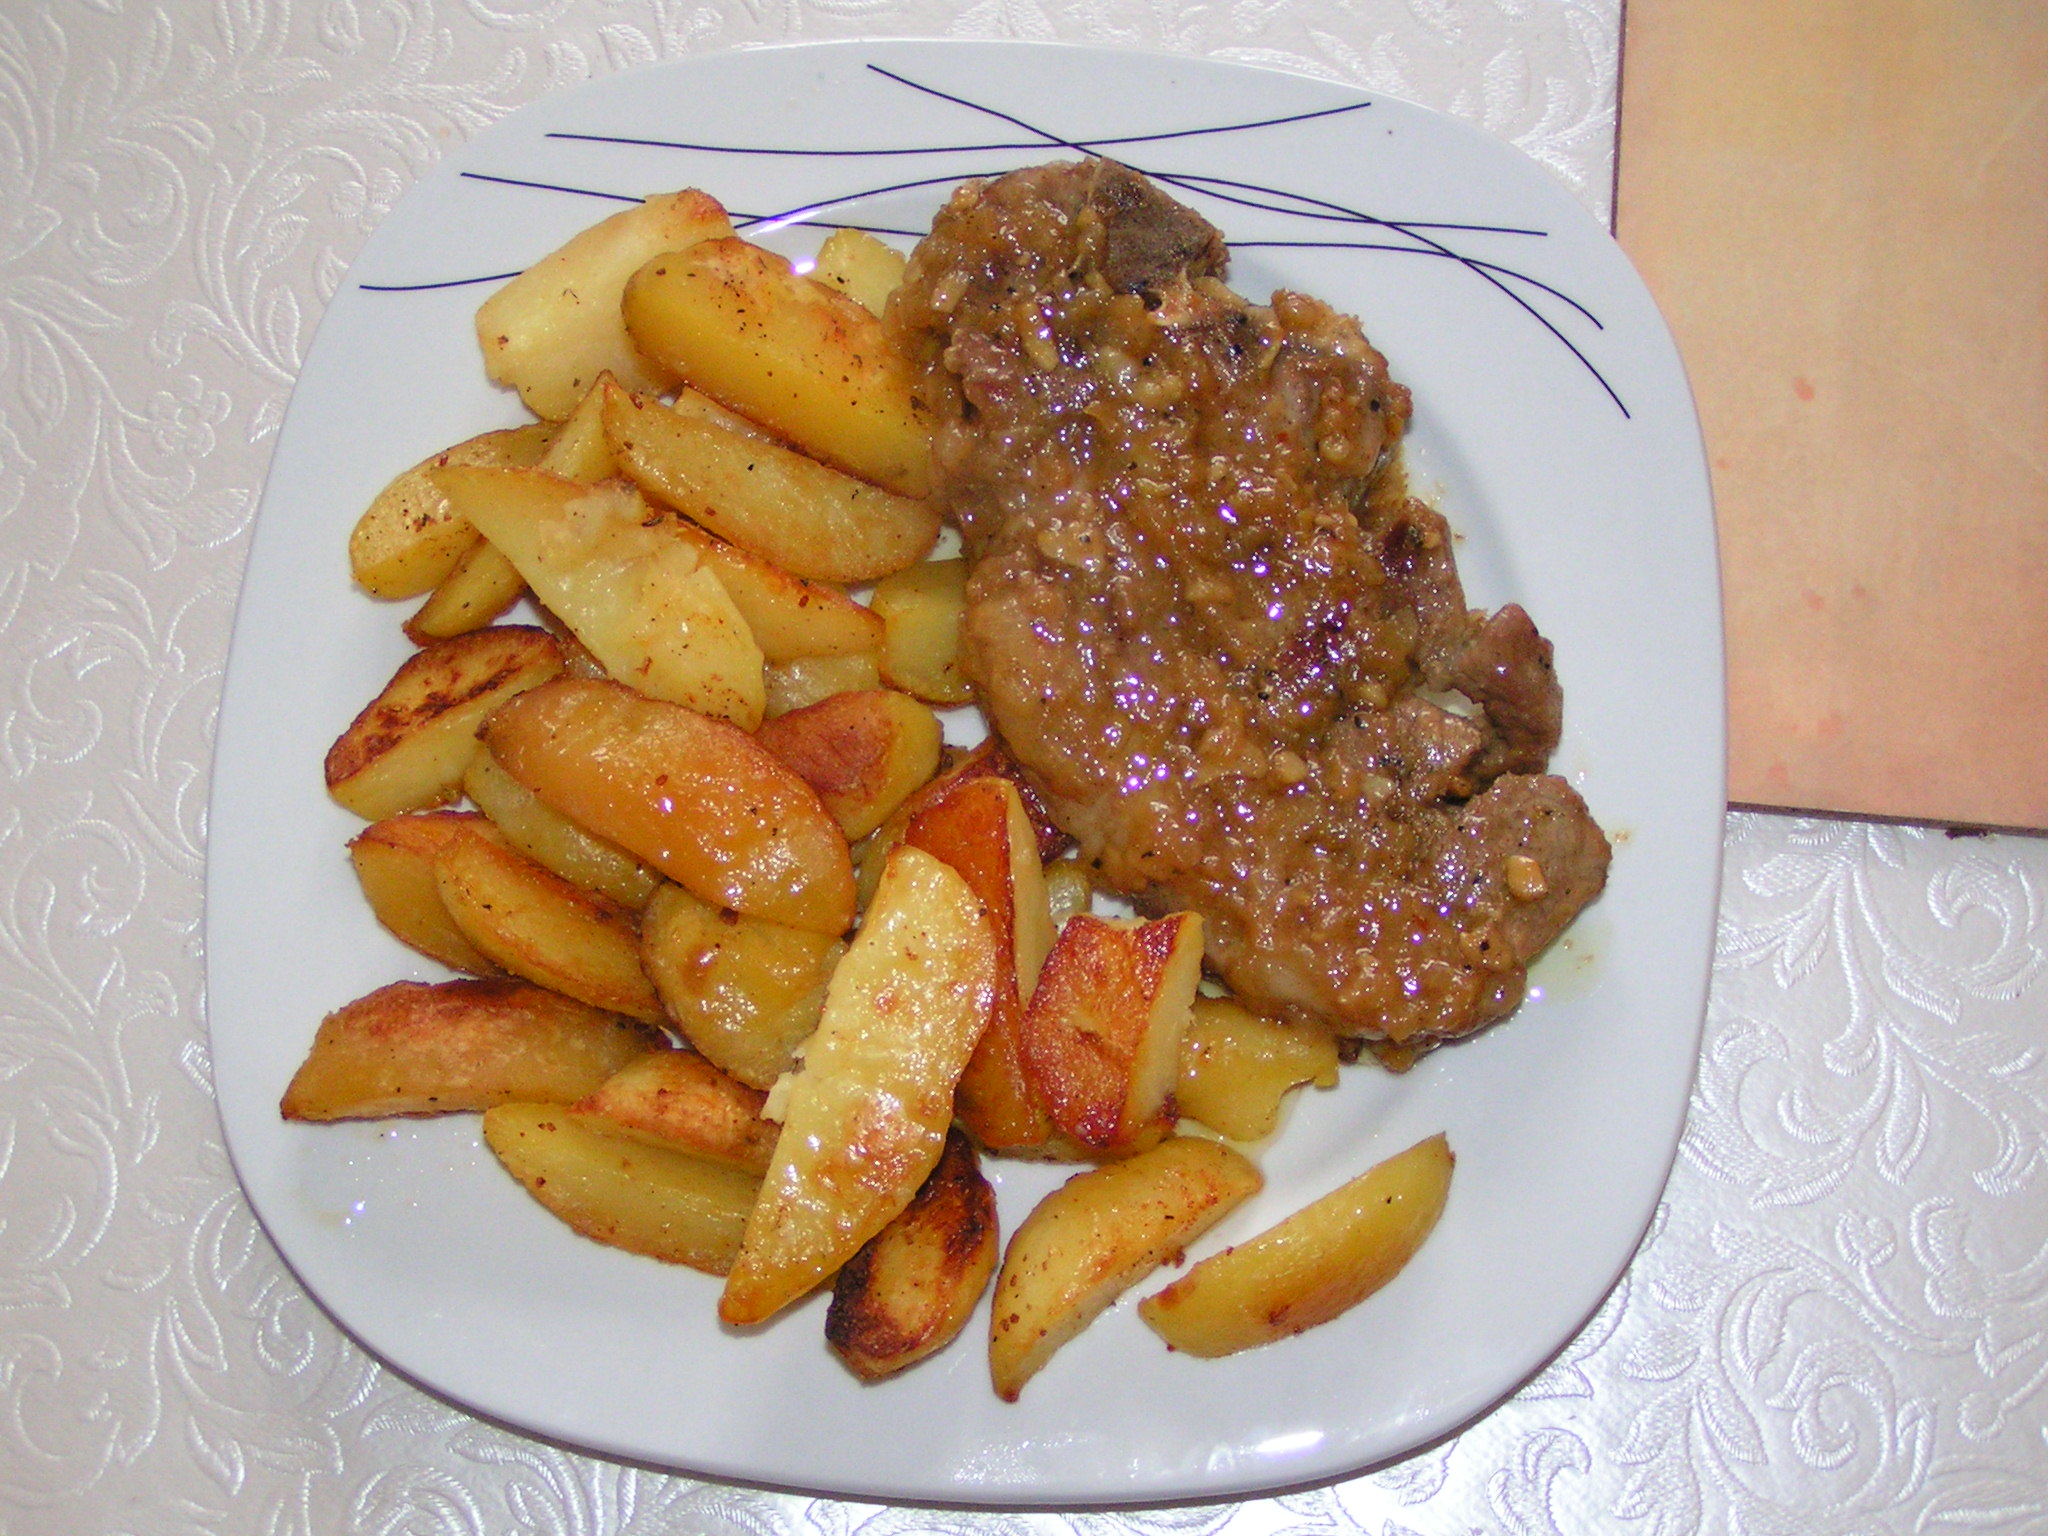 Vepřové steaky s restovanou šalotkou